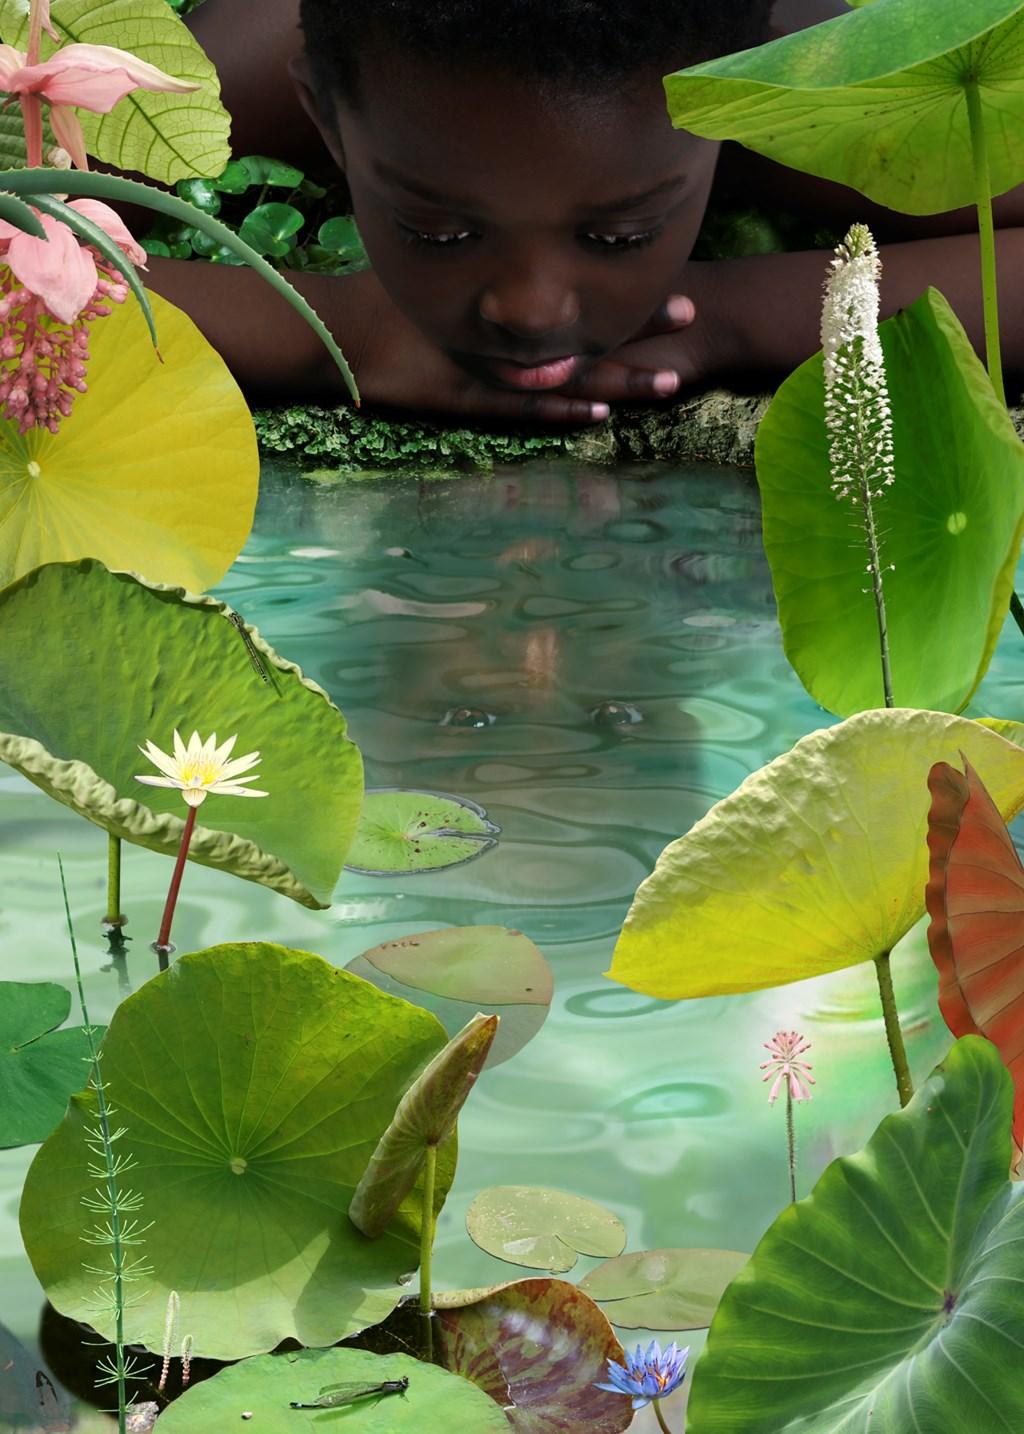 World # 23, 2006, ING Collectie Foto: Ruud van Empel © Persgroep